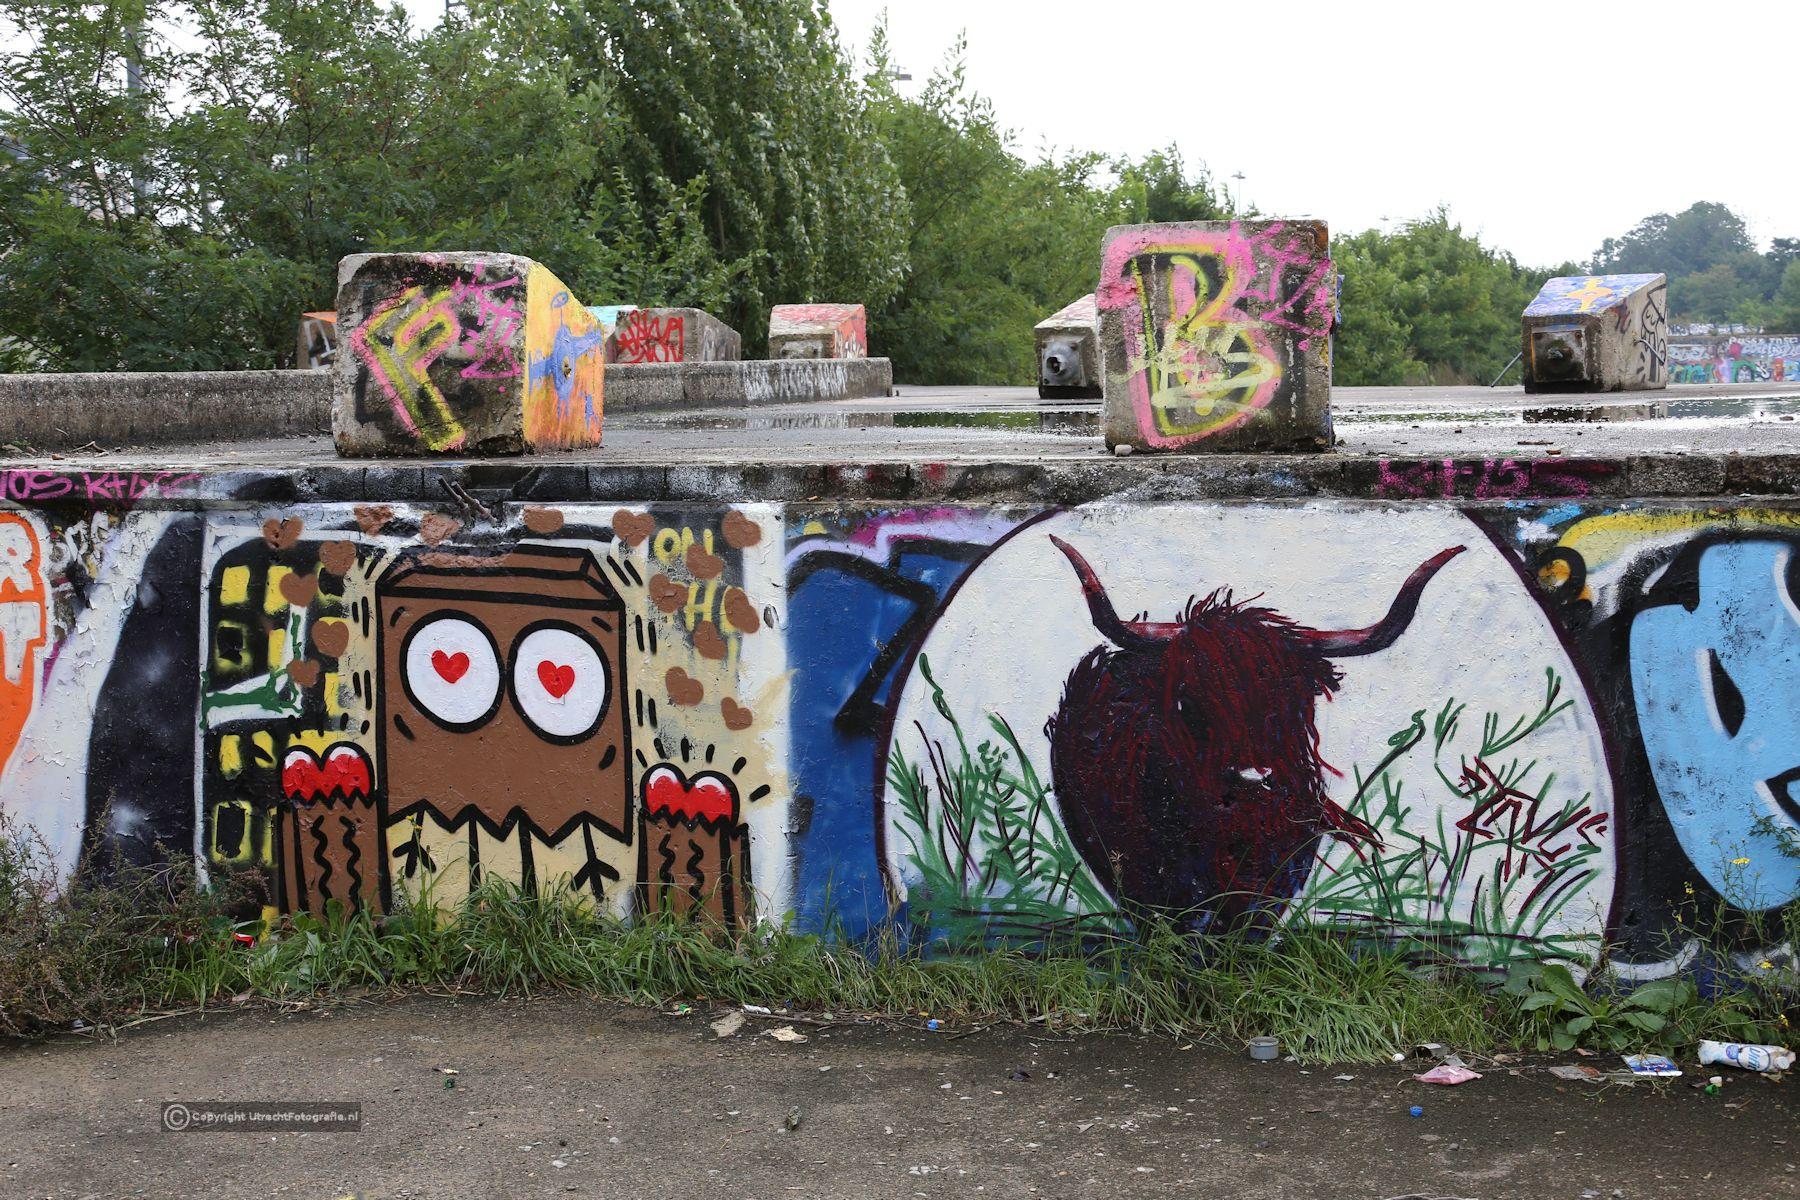 20170910 Graffitigebied 1